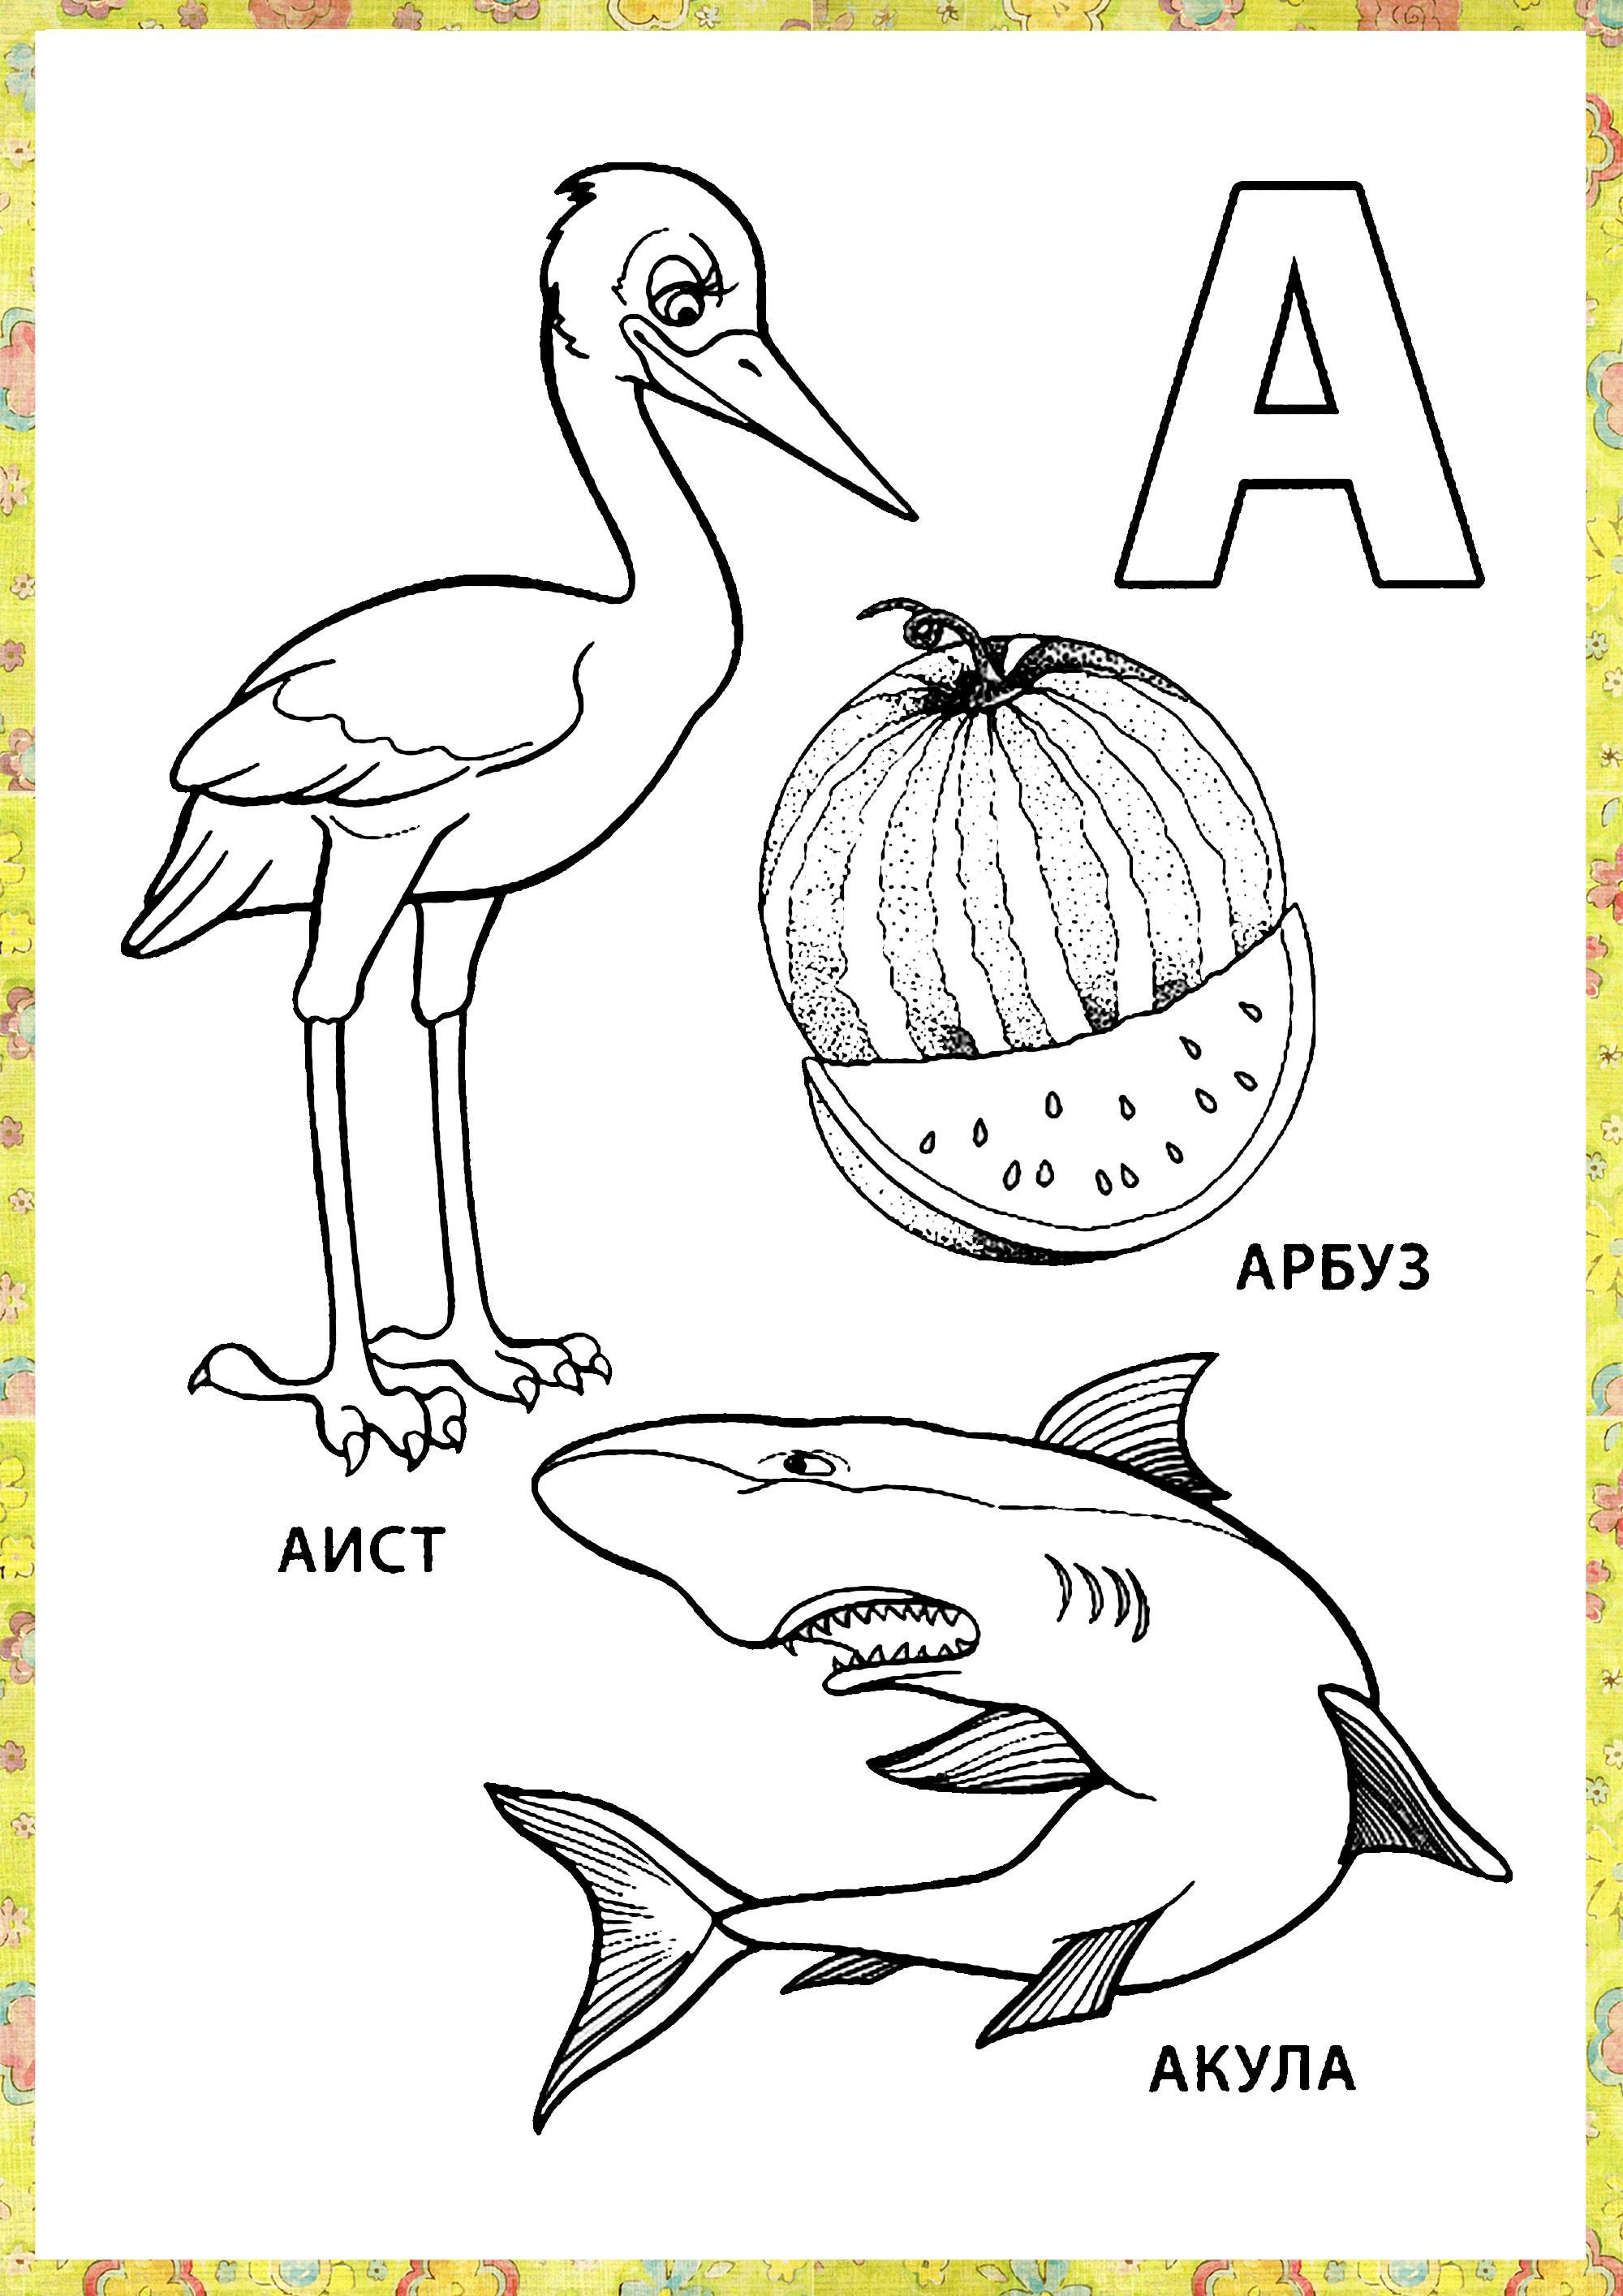 Раскраски учимся читать, буква а, аист, арбуз